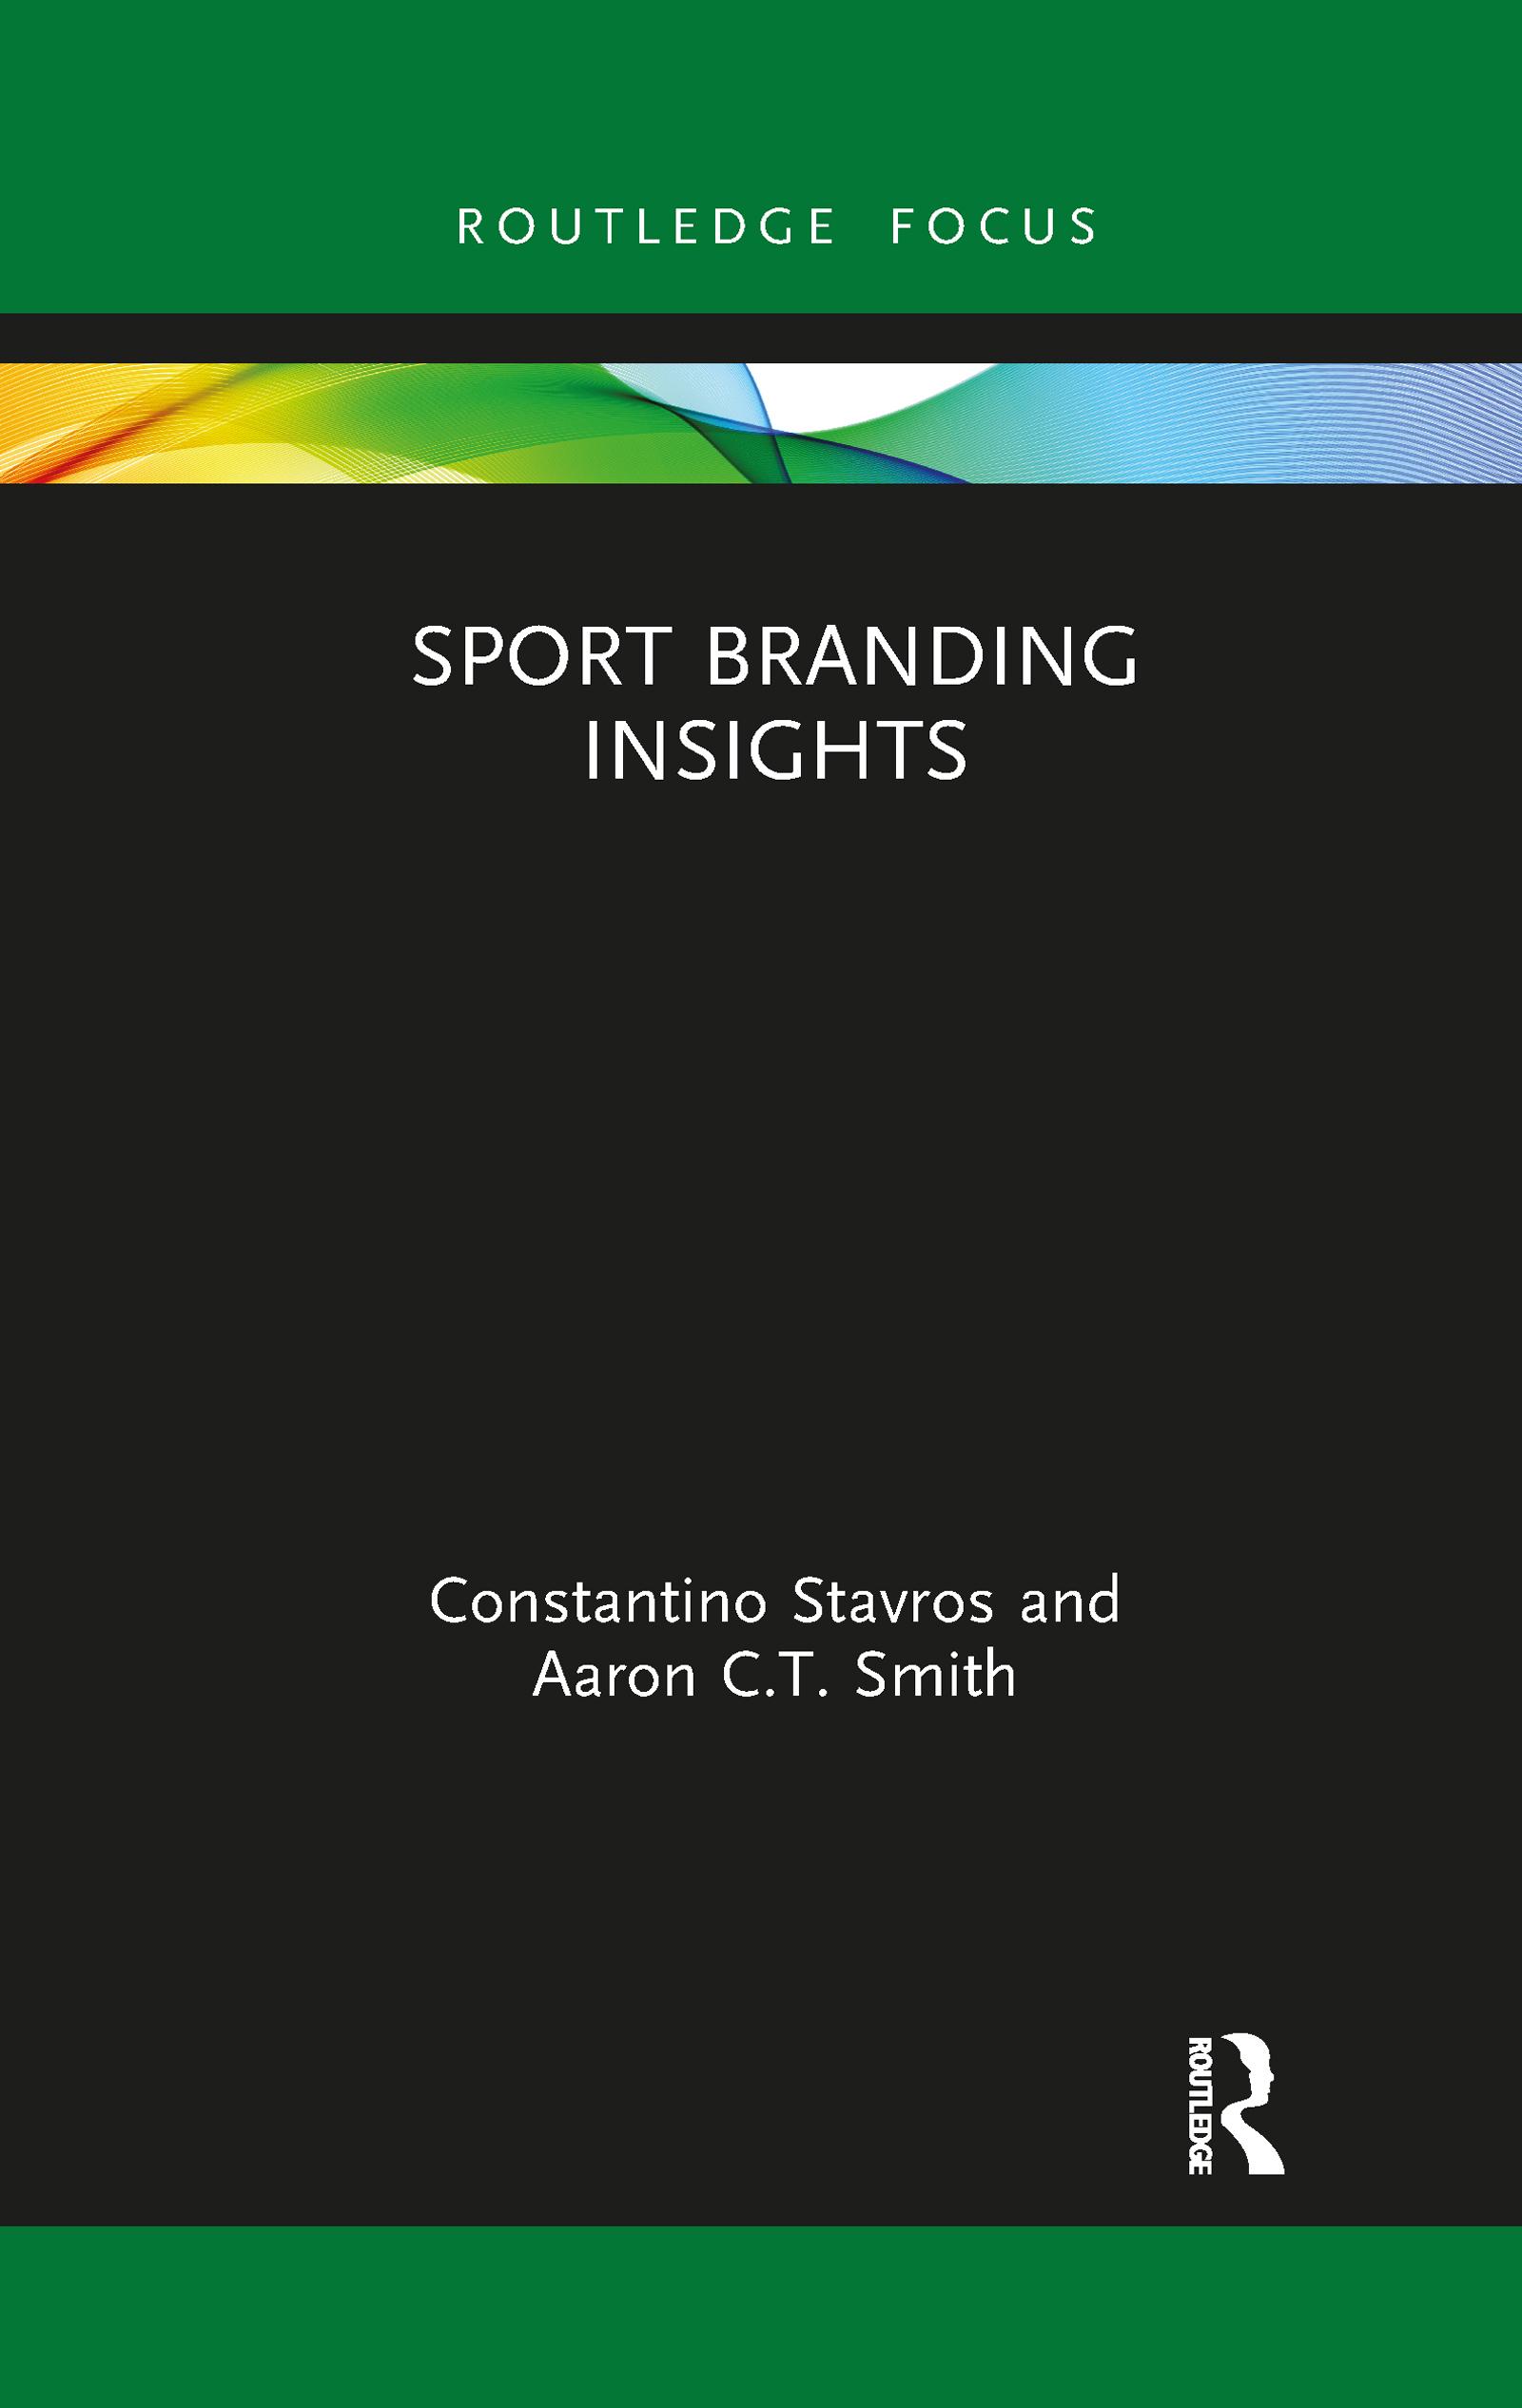 Sport Branding Insights